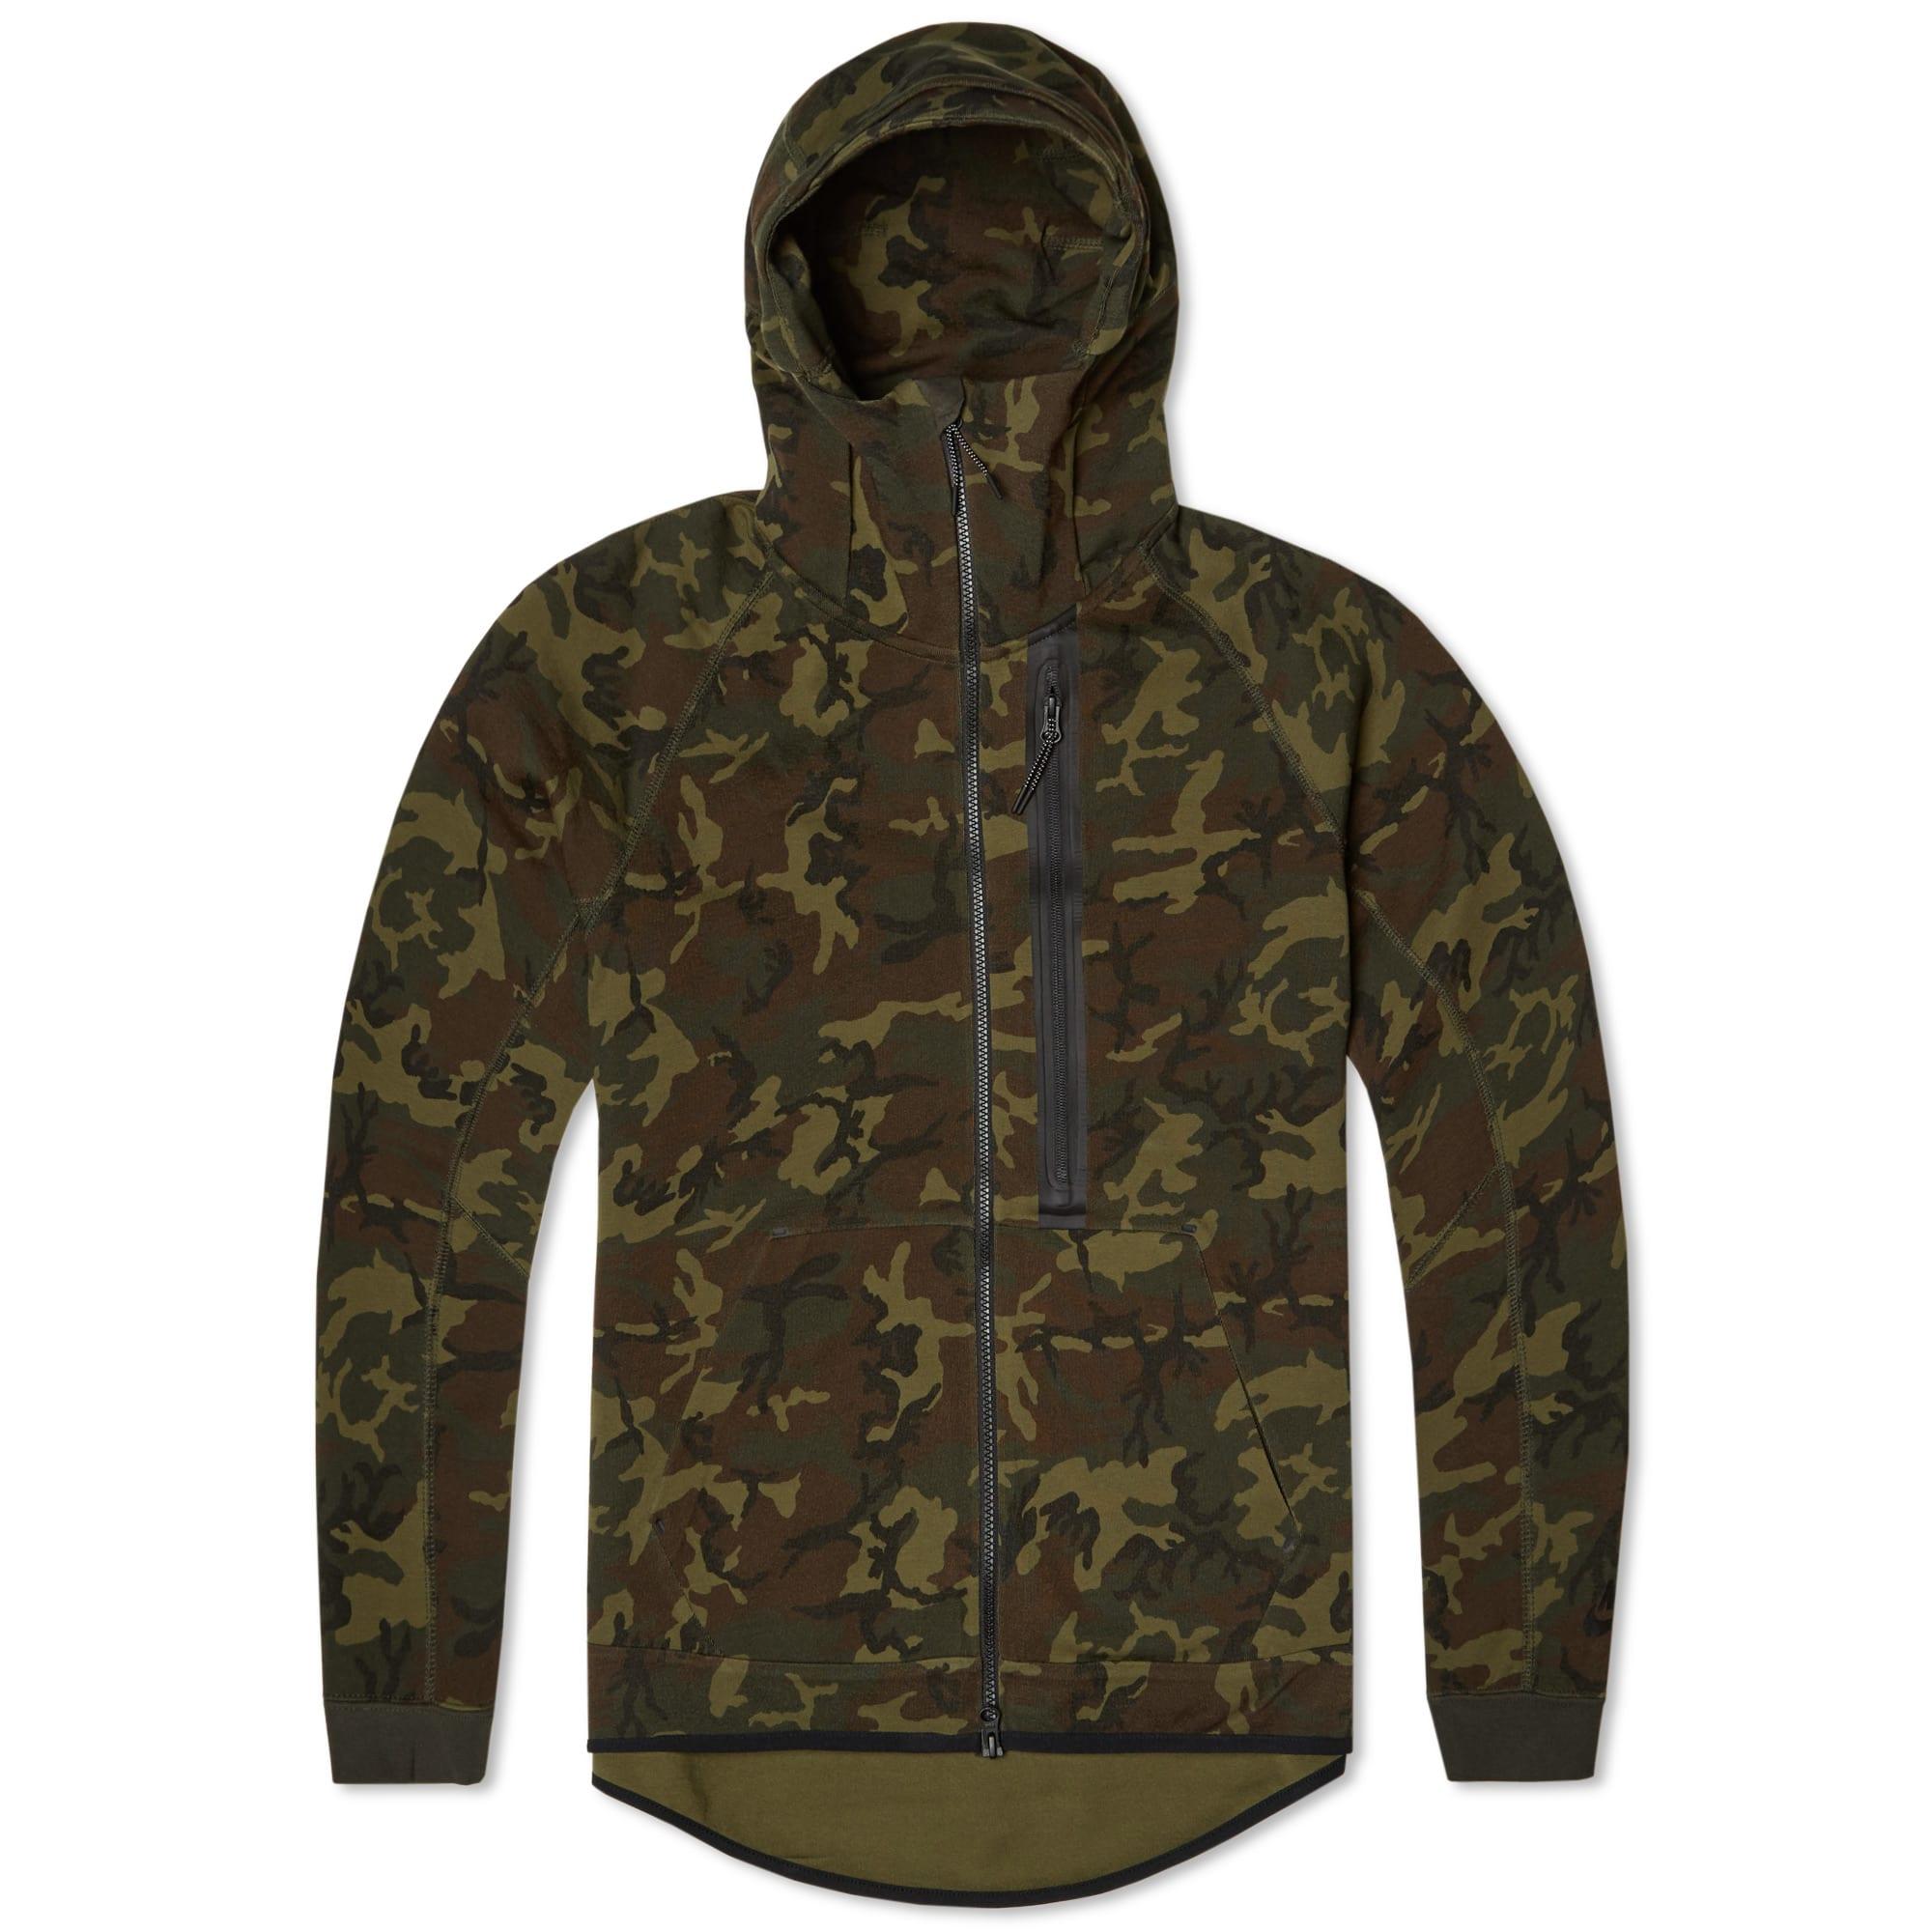 Nike jacket army - Nike Jacket Army 4